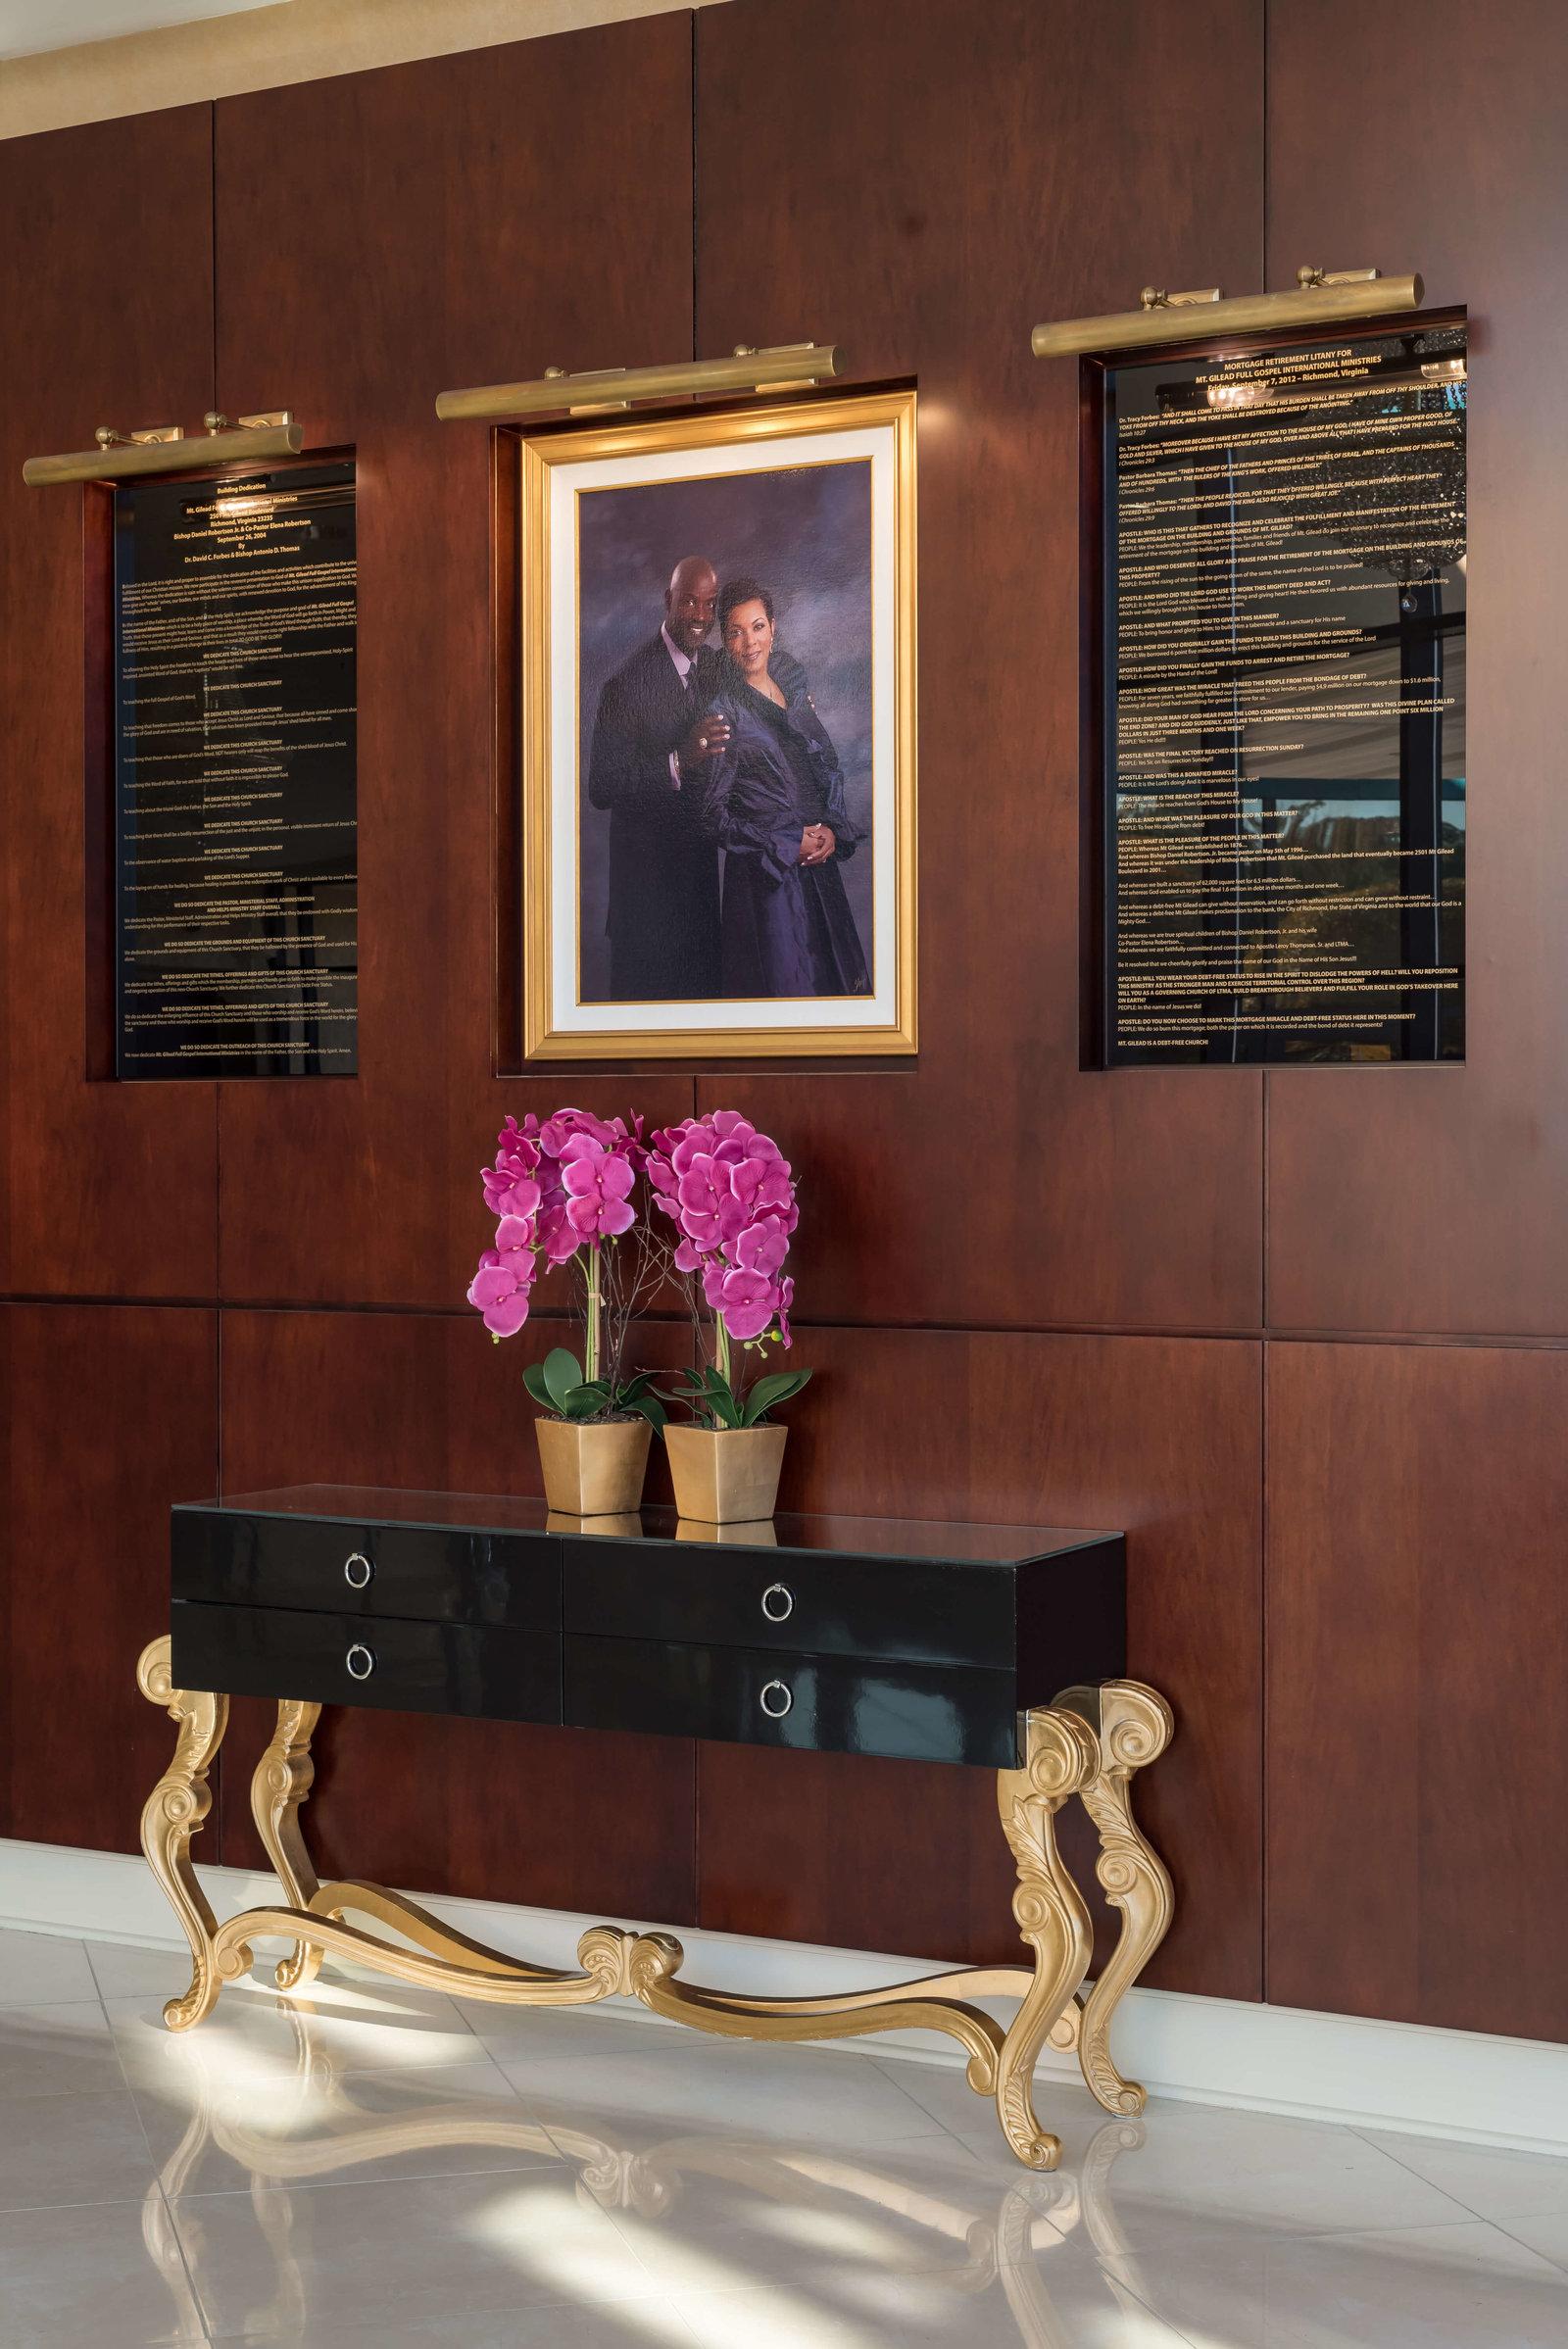 clark center sitter veterans richmond project interior va designers barfoot nexsen care